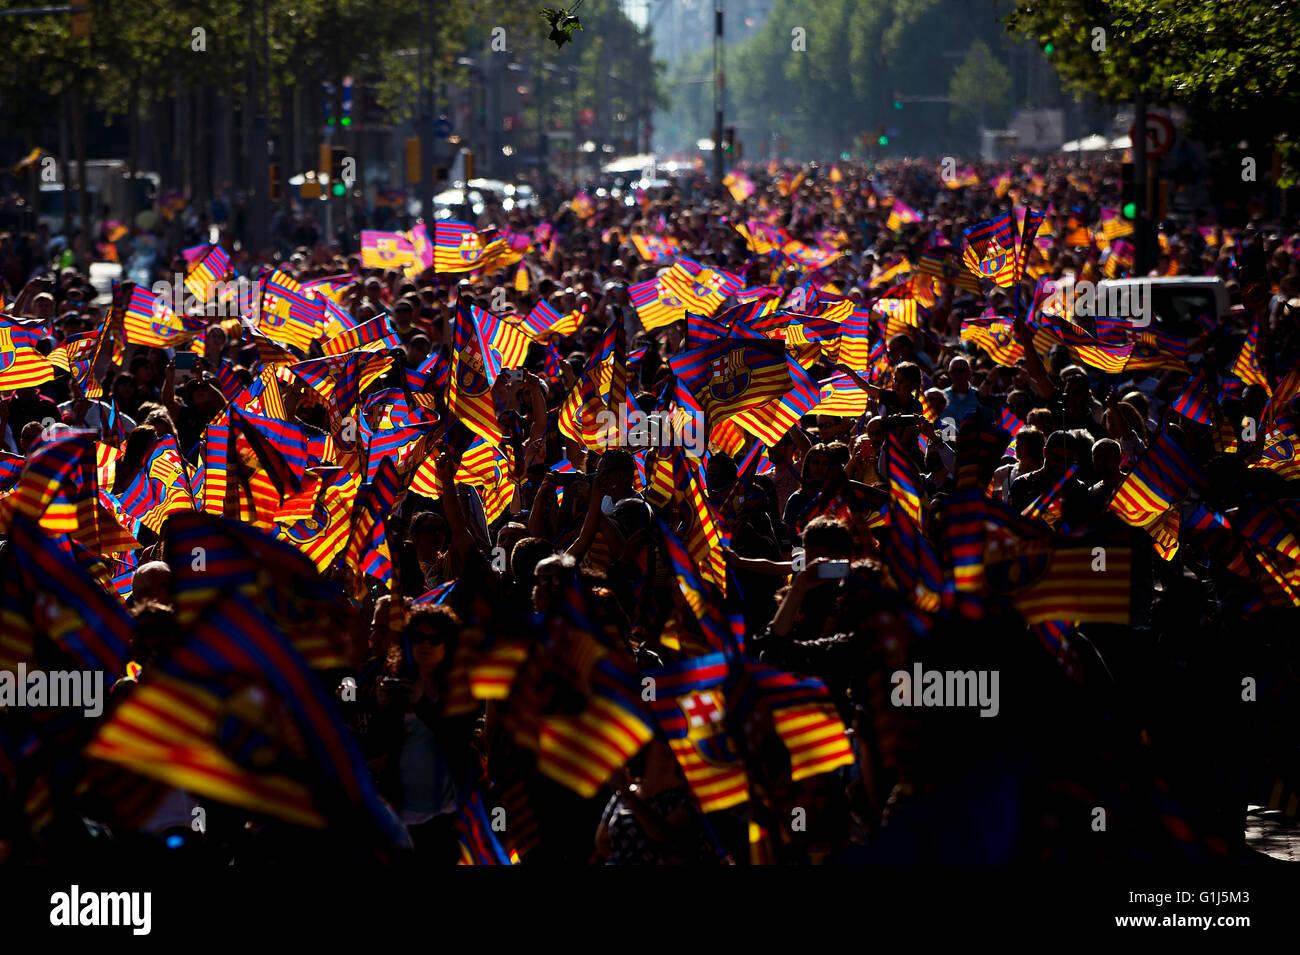 Barcelona, Spain. 15th May, 2016. Fans view FC Barcelona's celebration parade for winning the Spanish La Liga - Stock Image